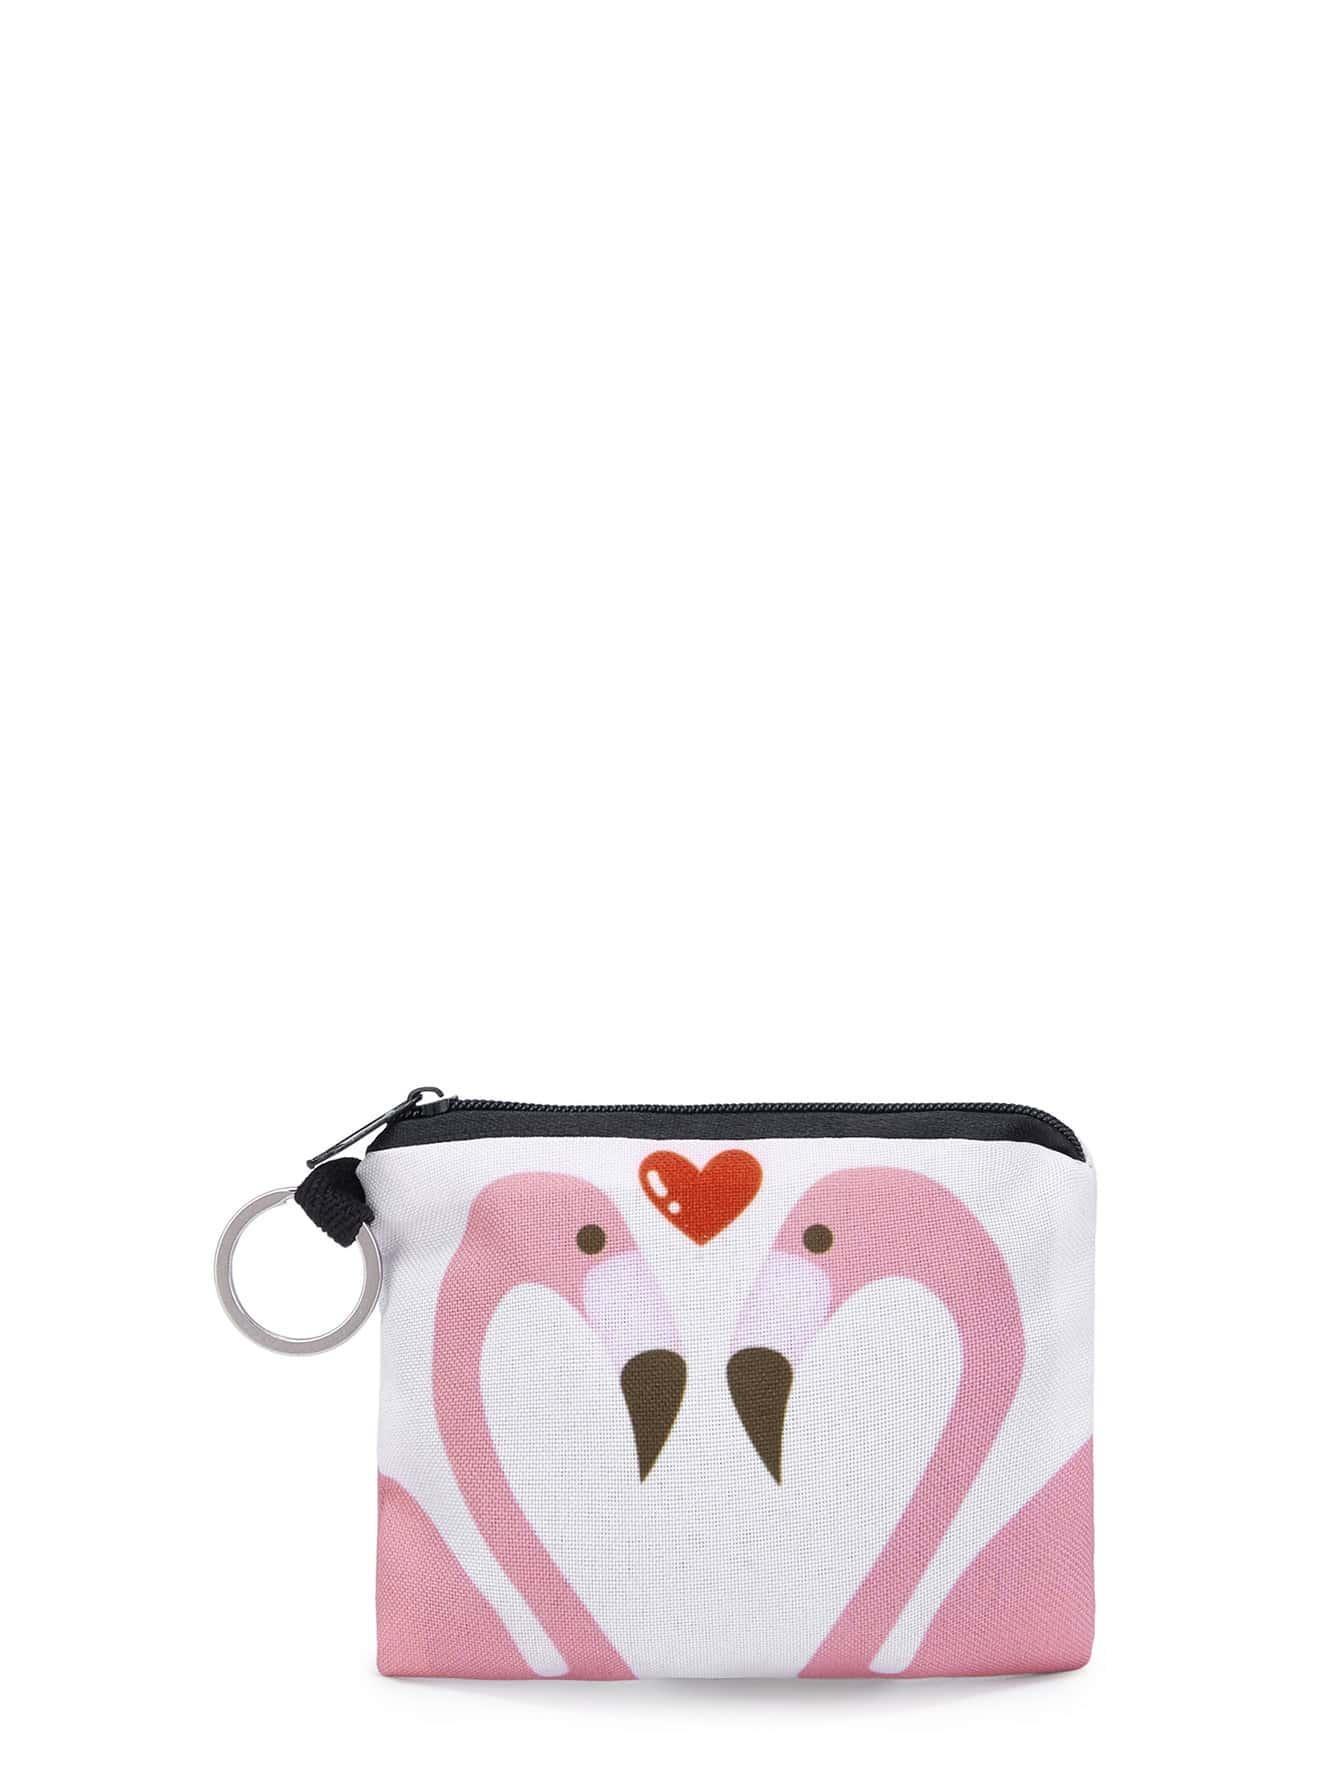 Flamingo & Heart Print Pouch